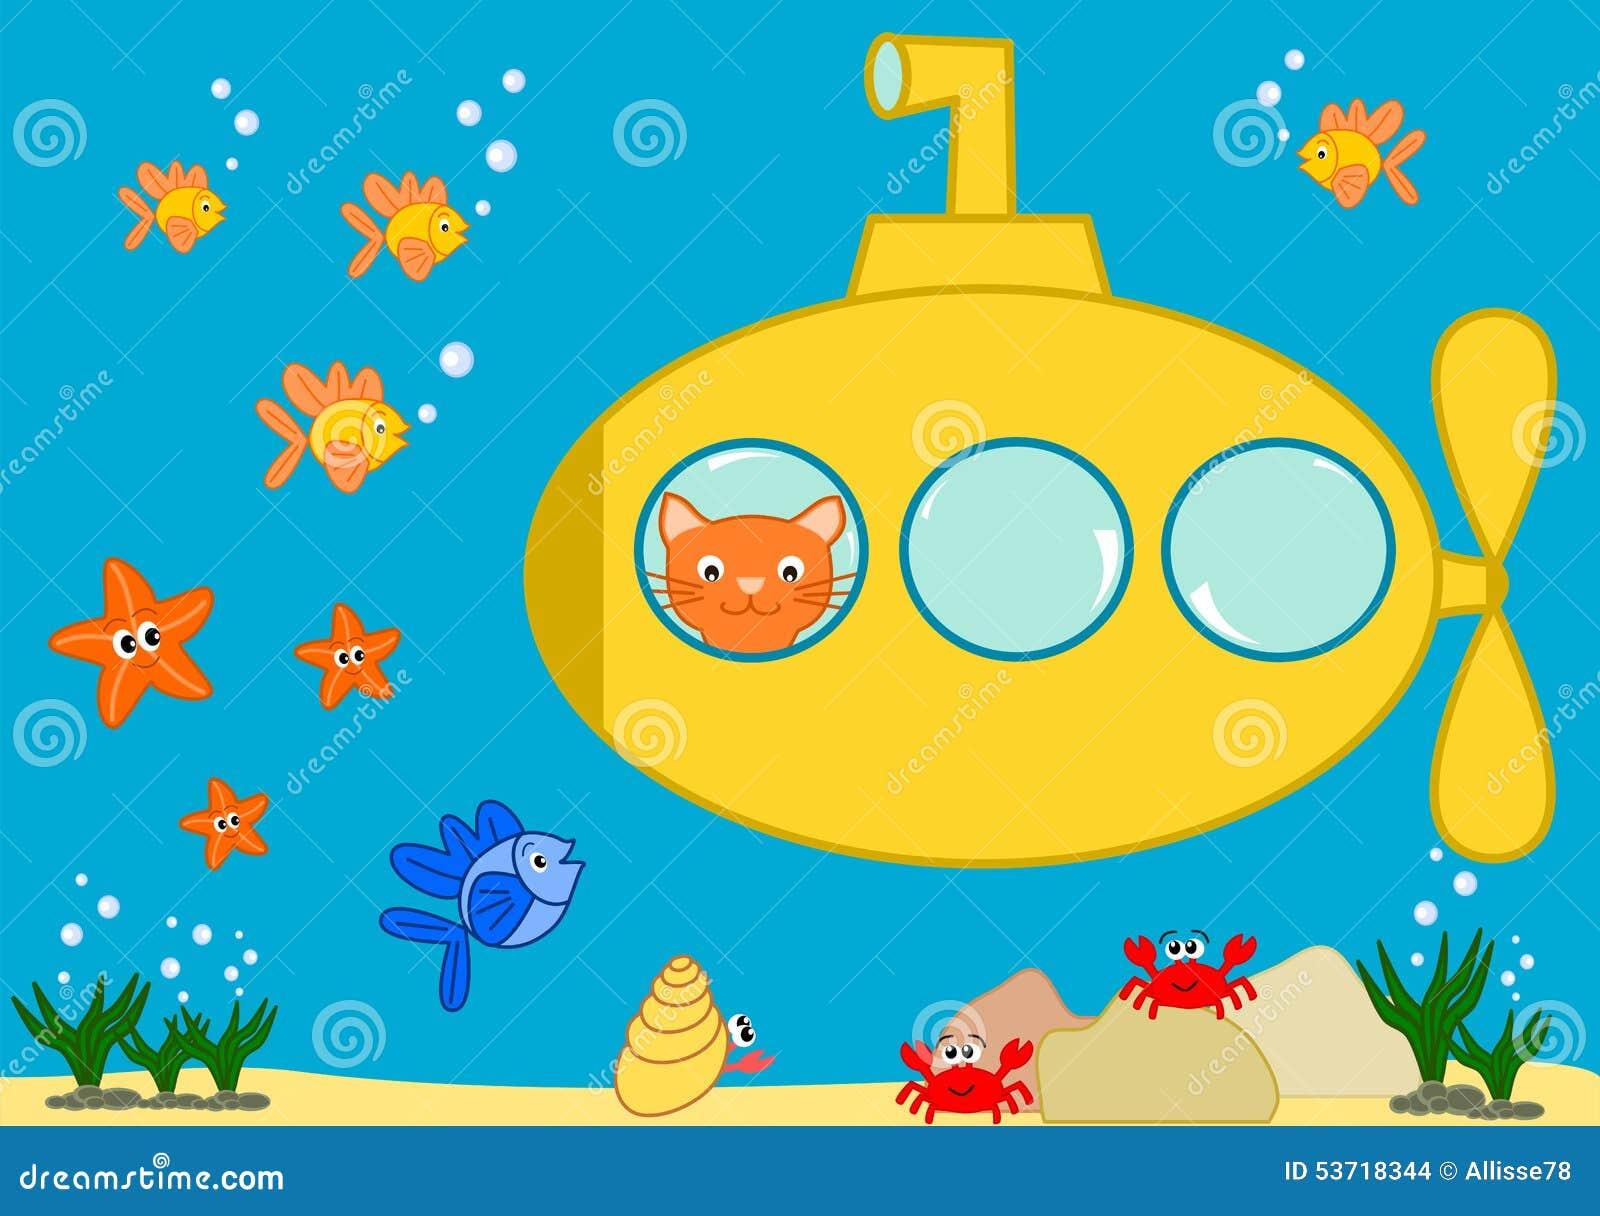 Orange Cat In A Yellow Submarine Funny Cartoon Illustration Stock